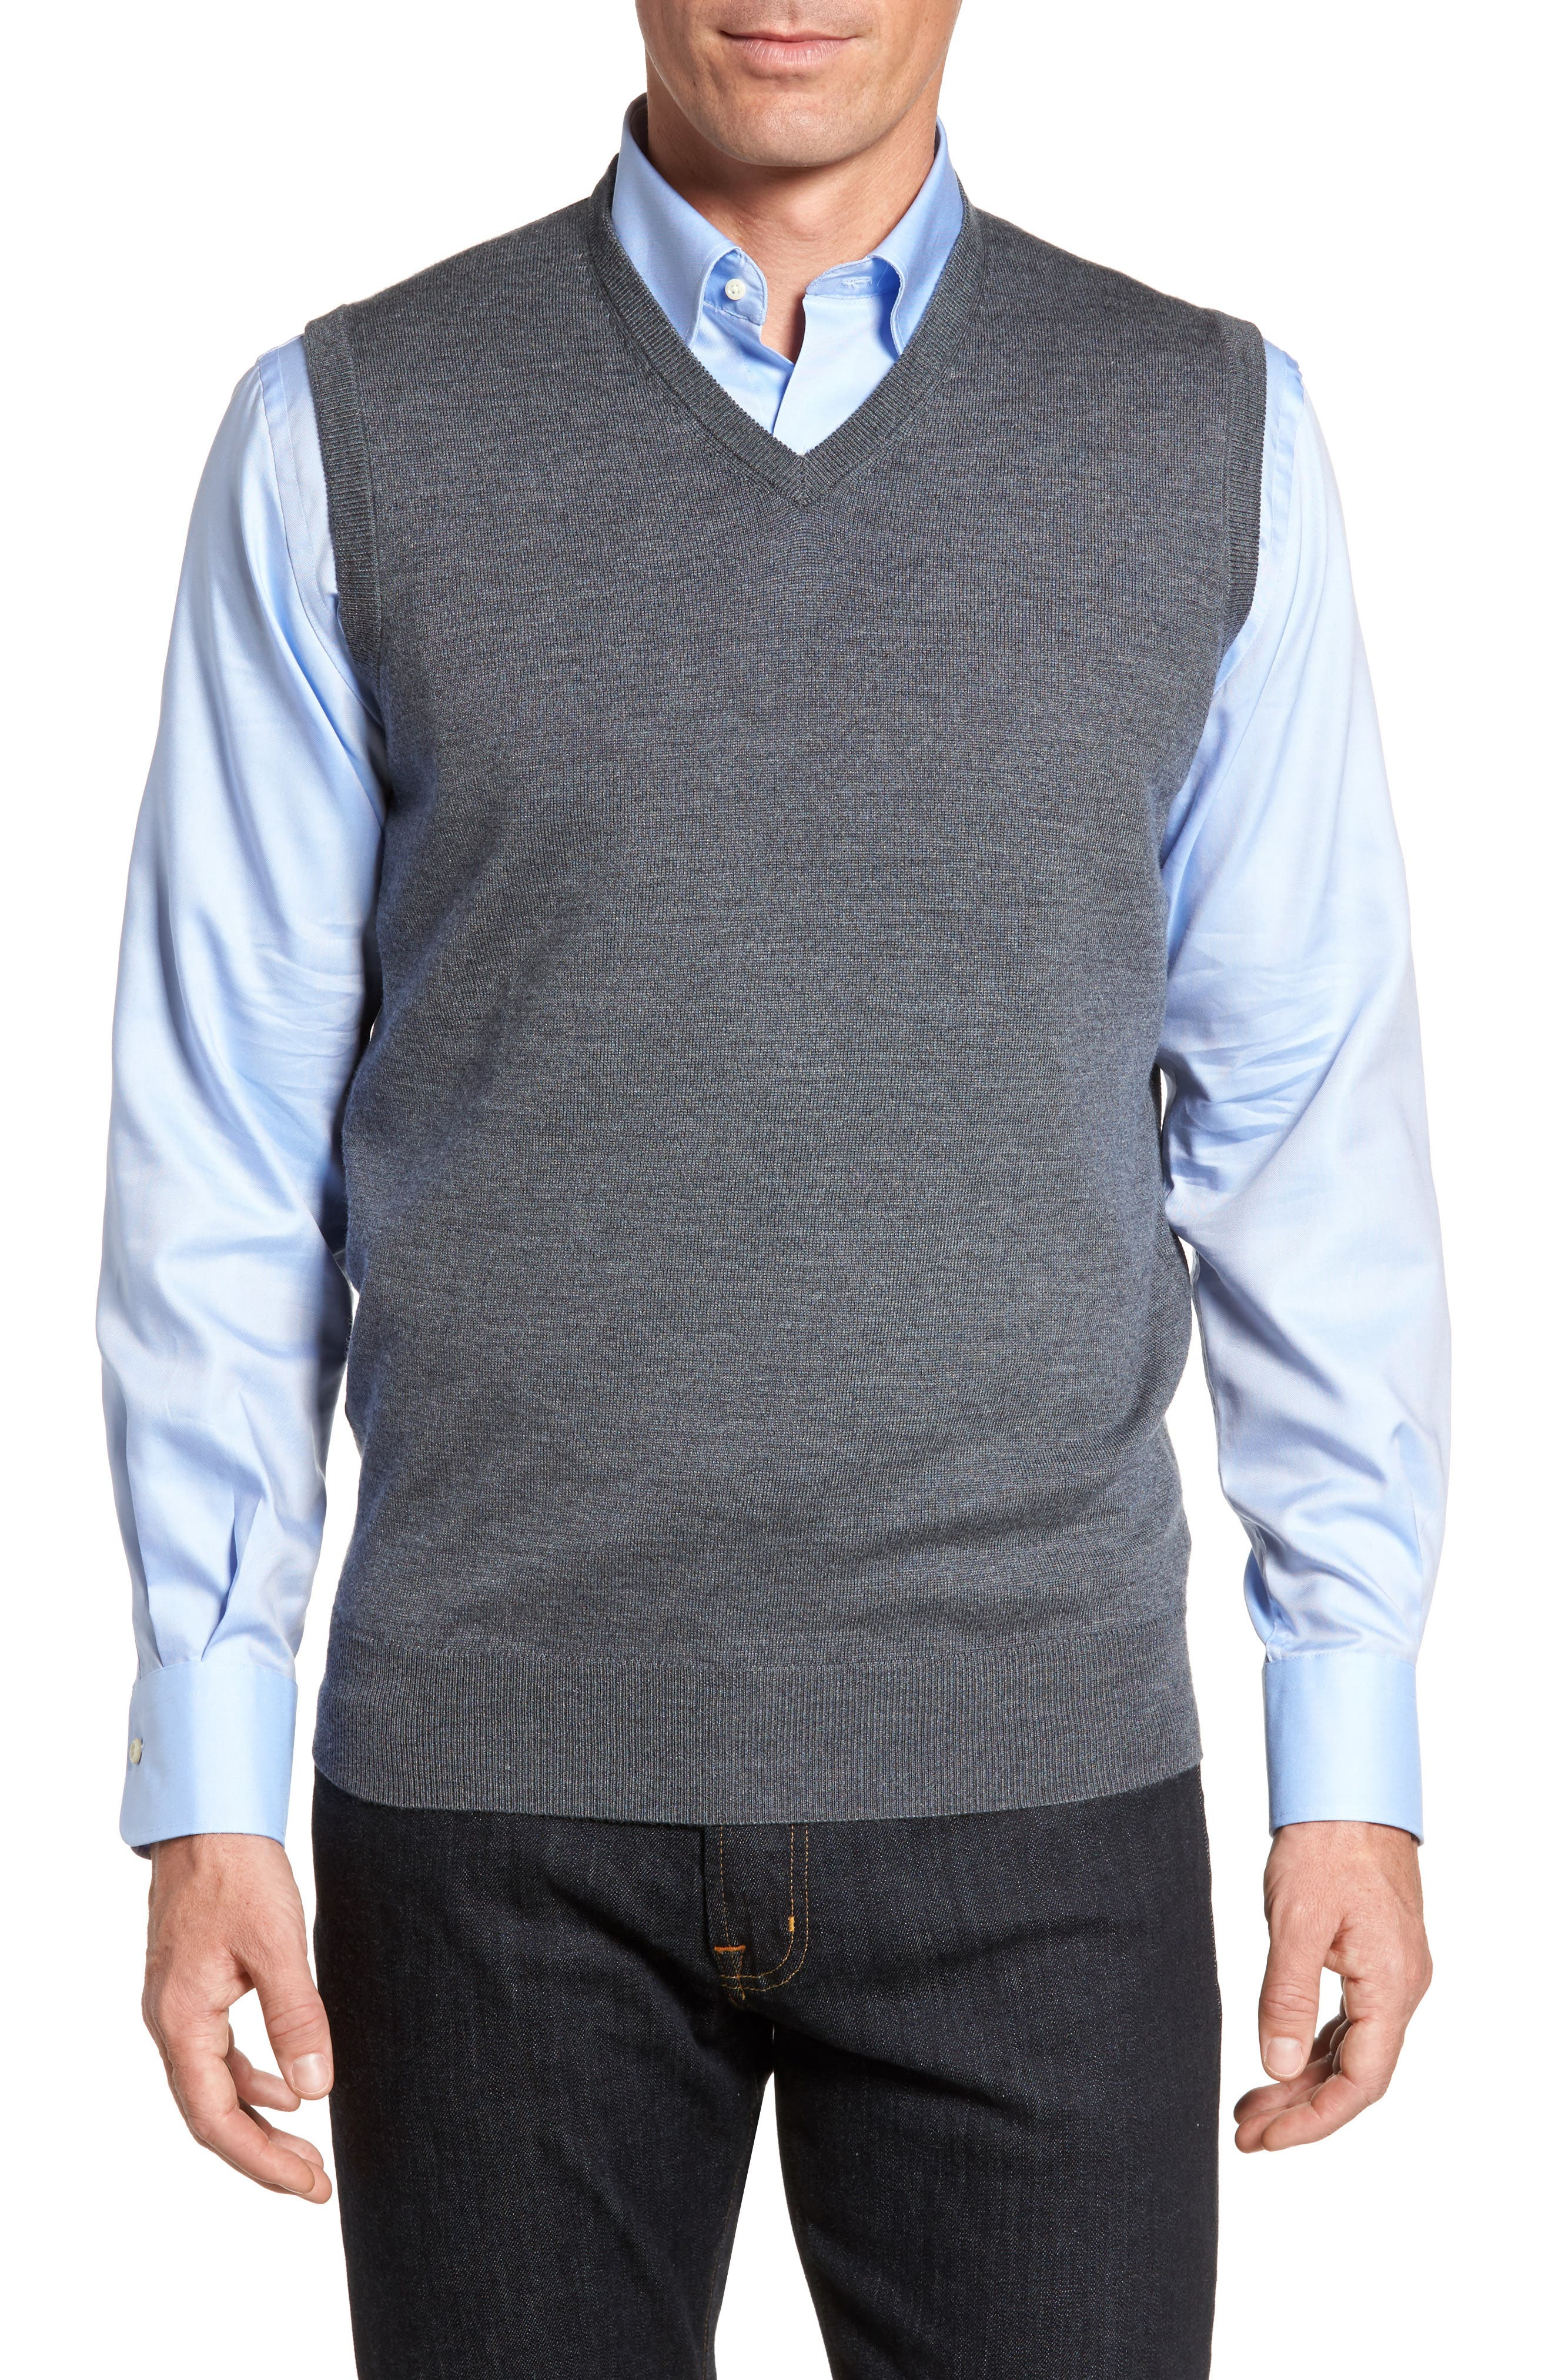 Crown Merino Blend Knit Vest,                             Main thumbnail 1, color,                             Charcoal